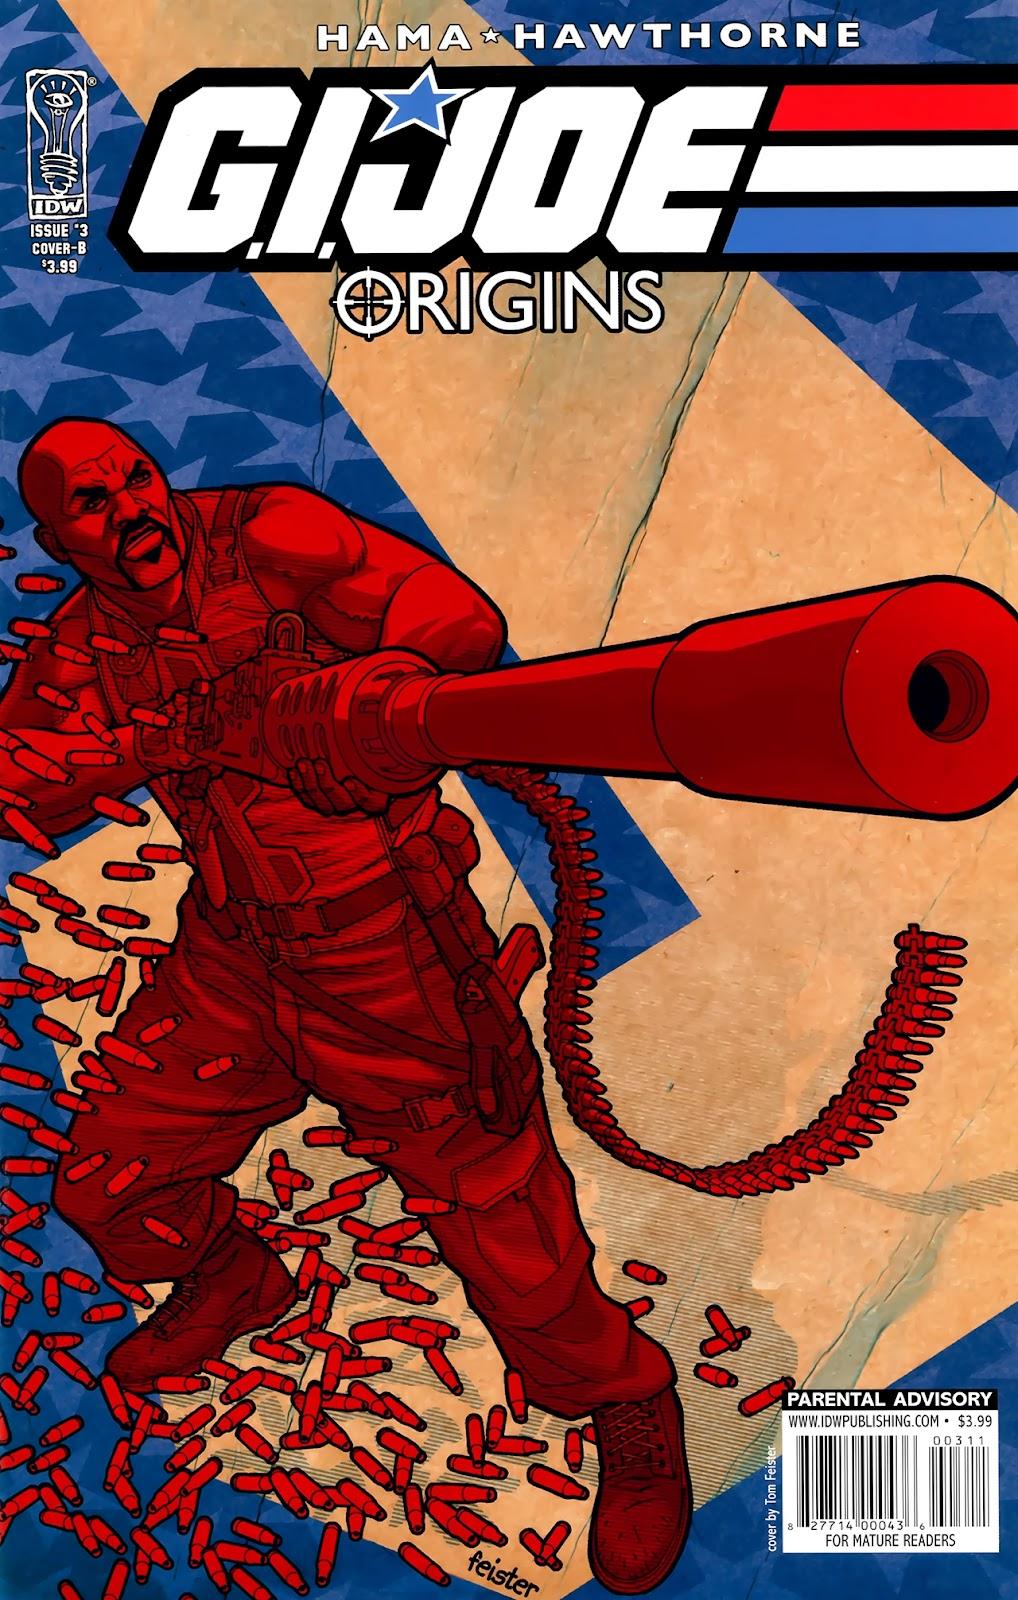 G.I. Joe: Origins issue 3 - Page 2